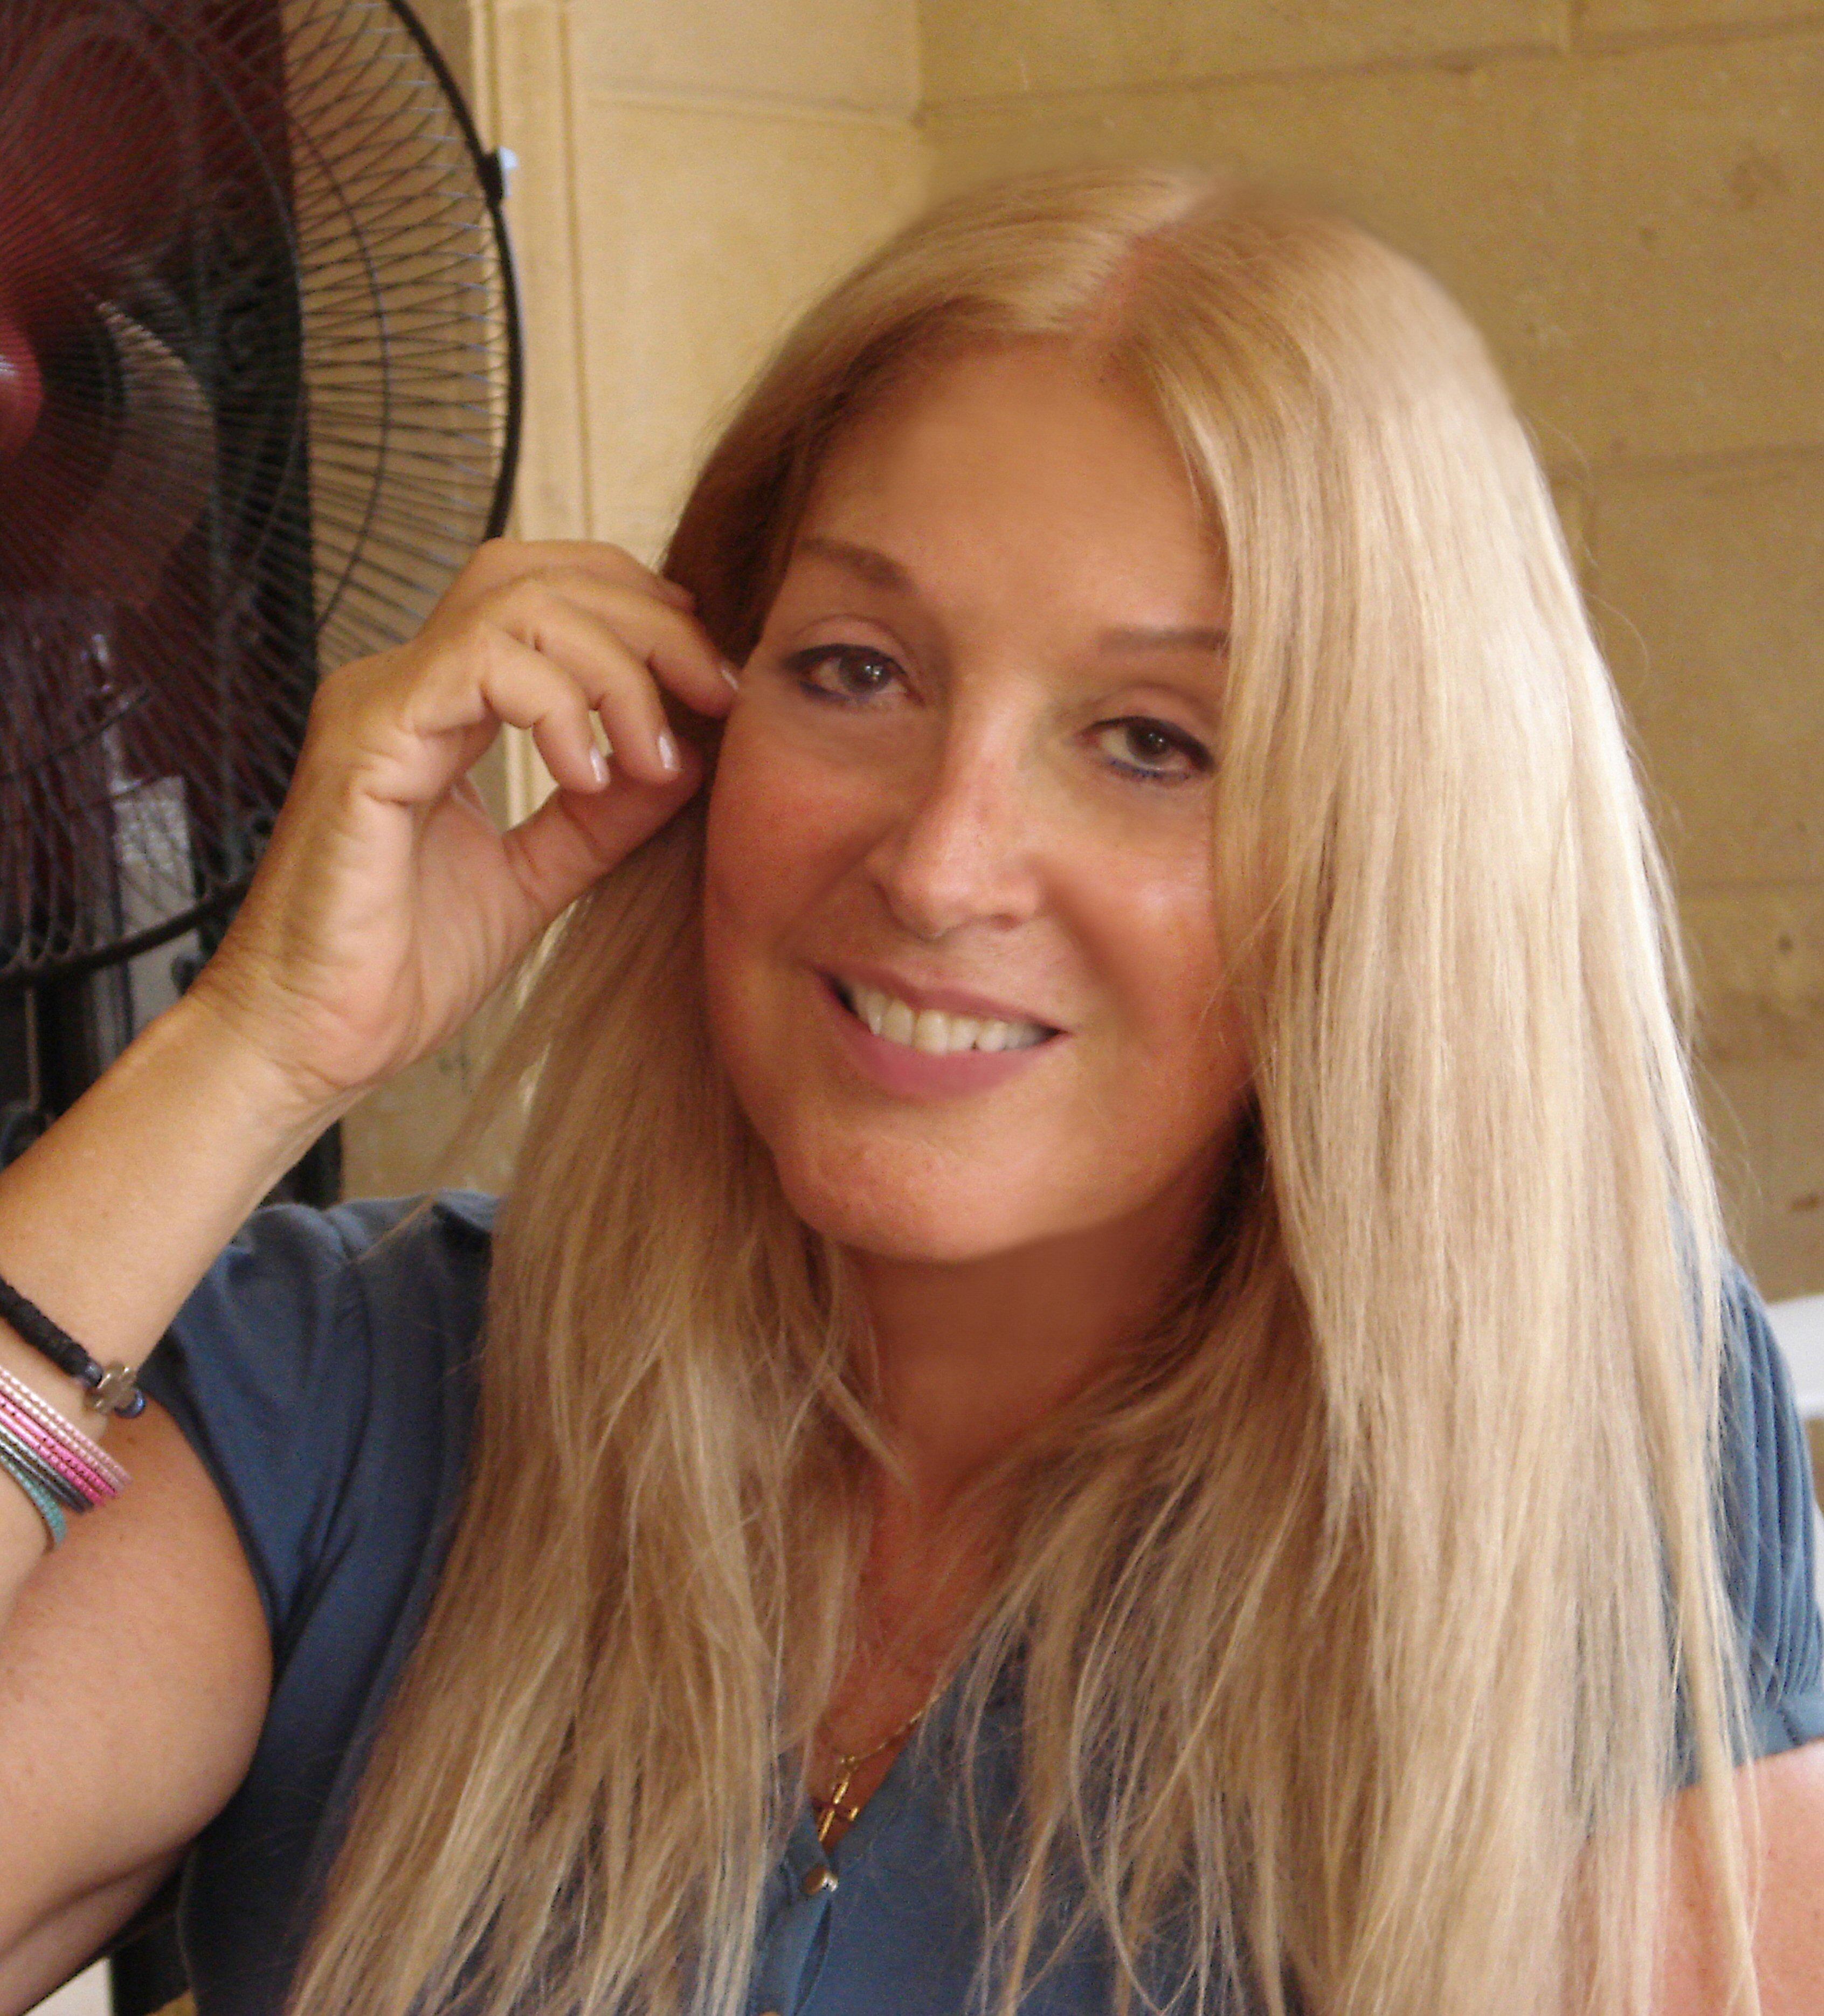 Vassula Rydén Turns the Voice of God Into a Bestseller